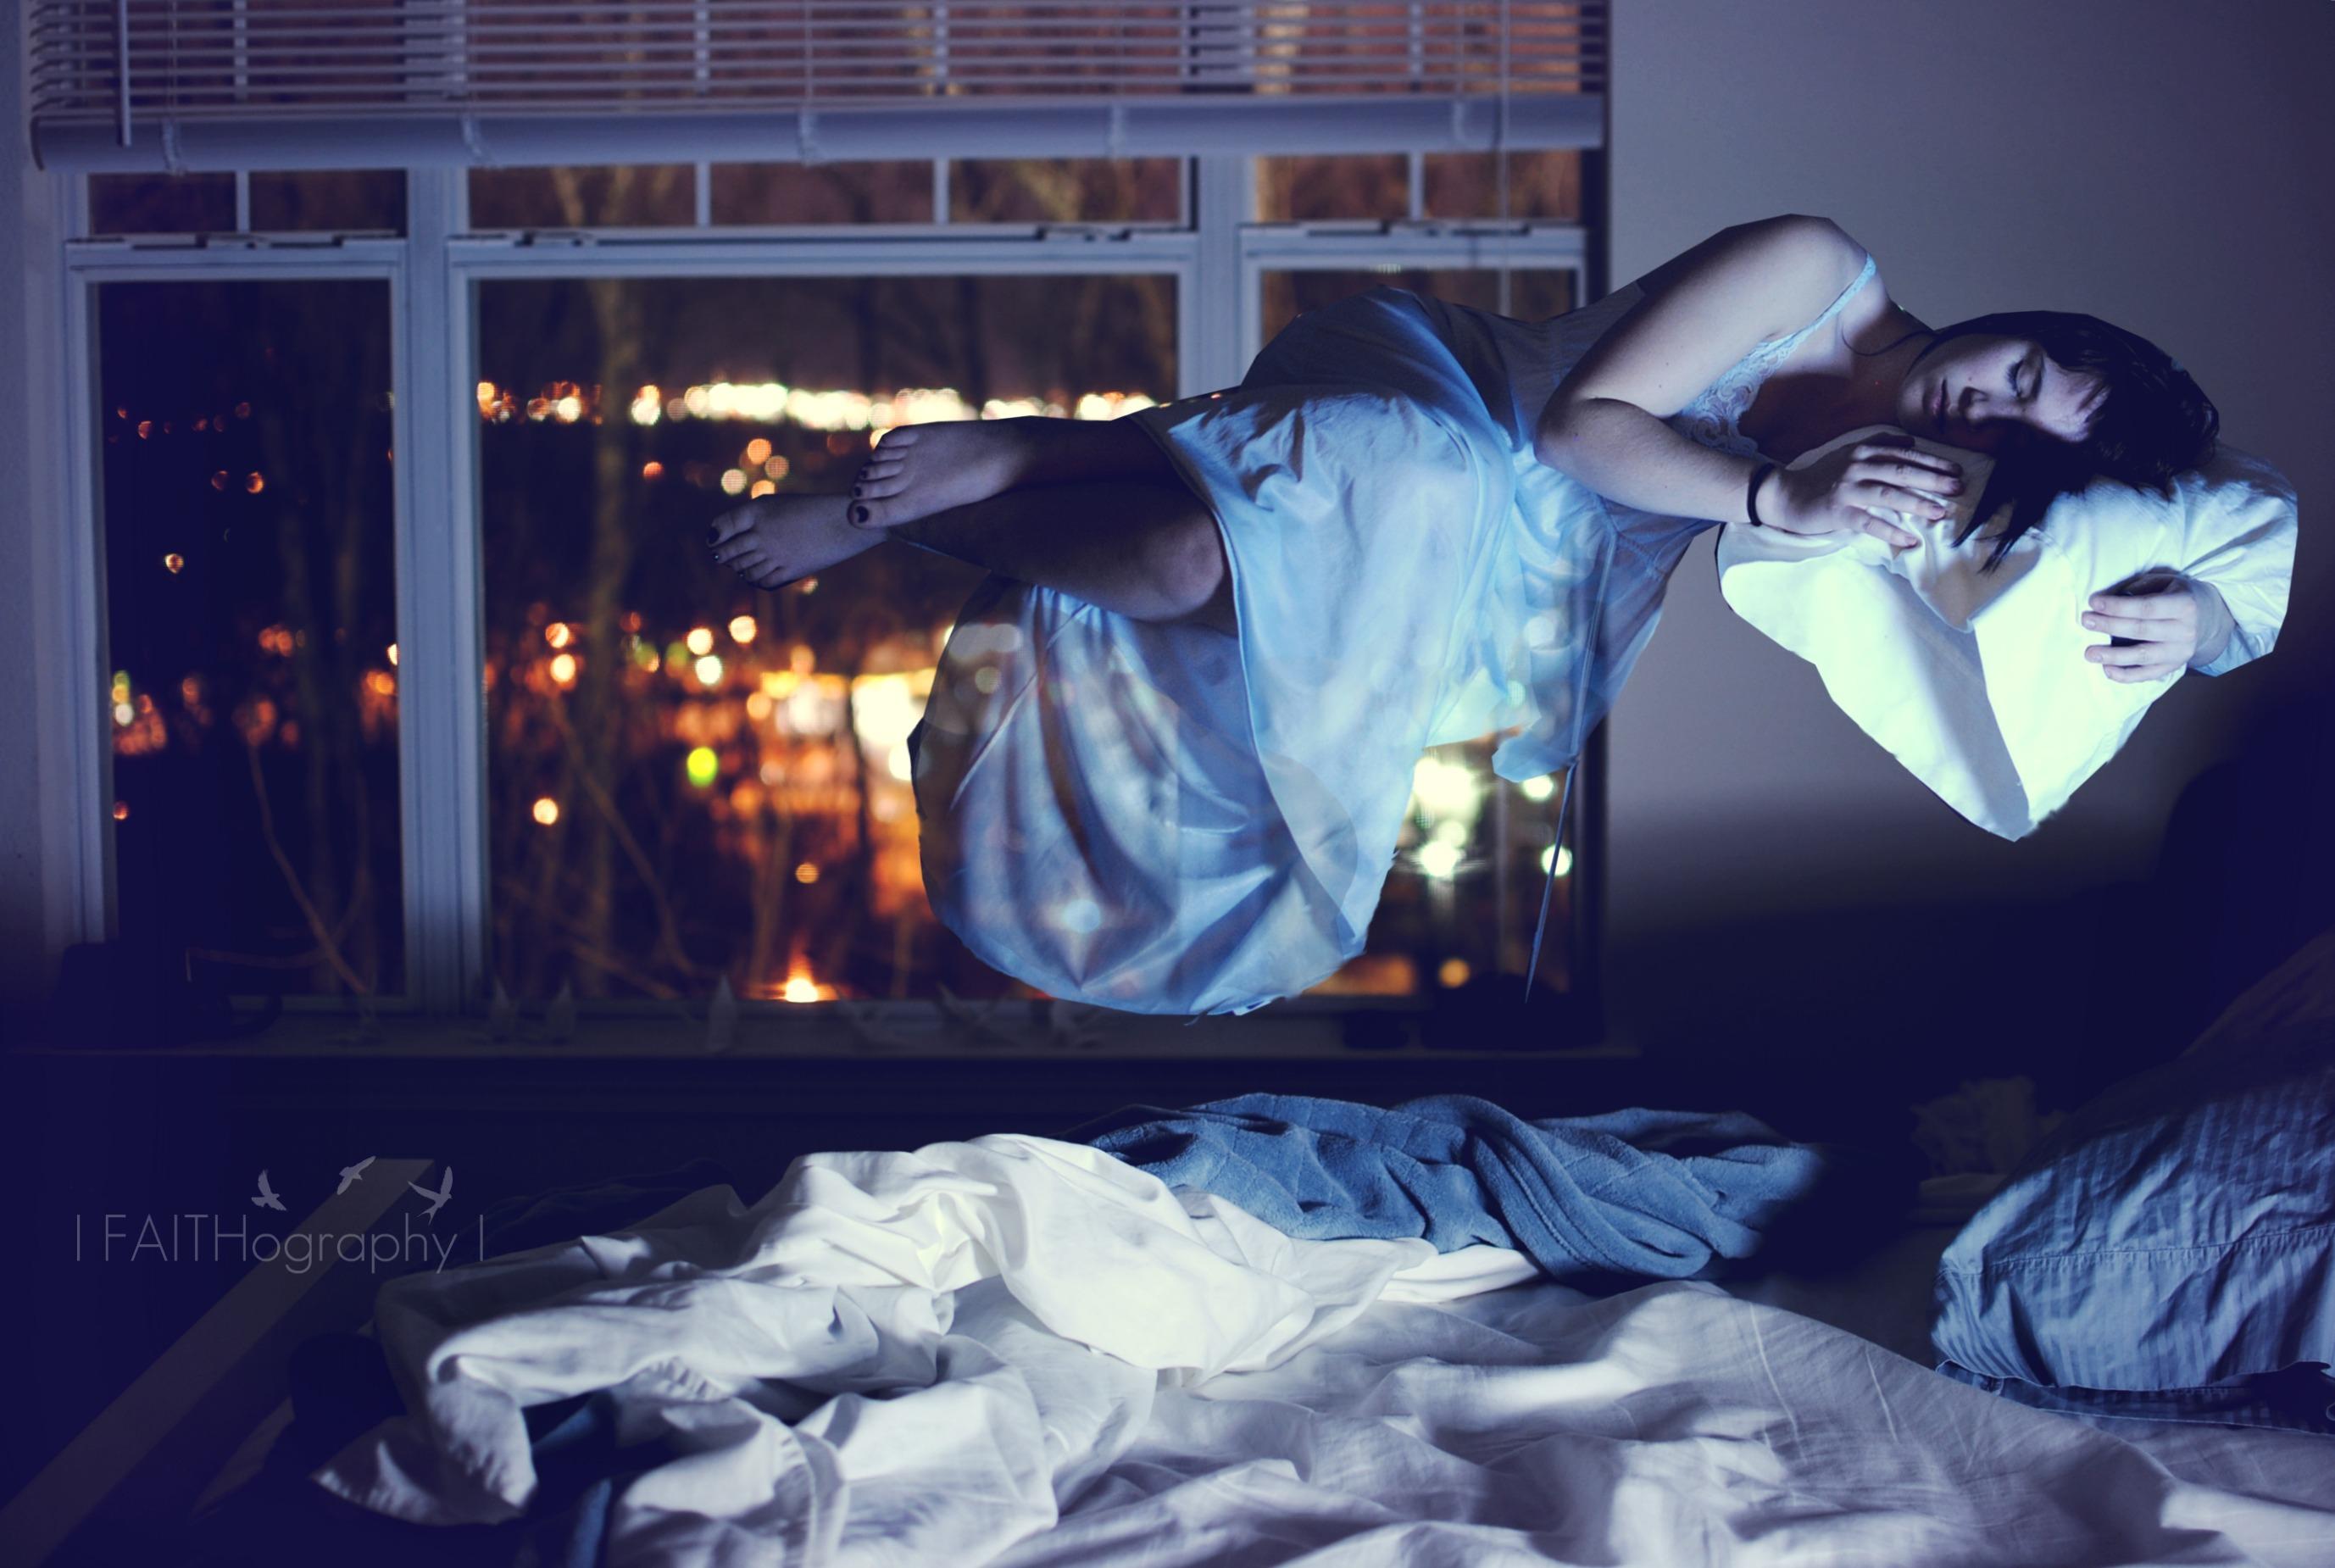 Window Night Space Love Bed Dress Calm Nikon Bokeh Peace Sleep Midnight Light Girl Layers Fun